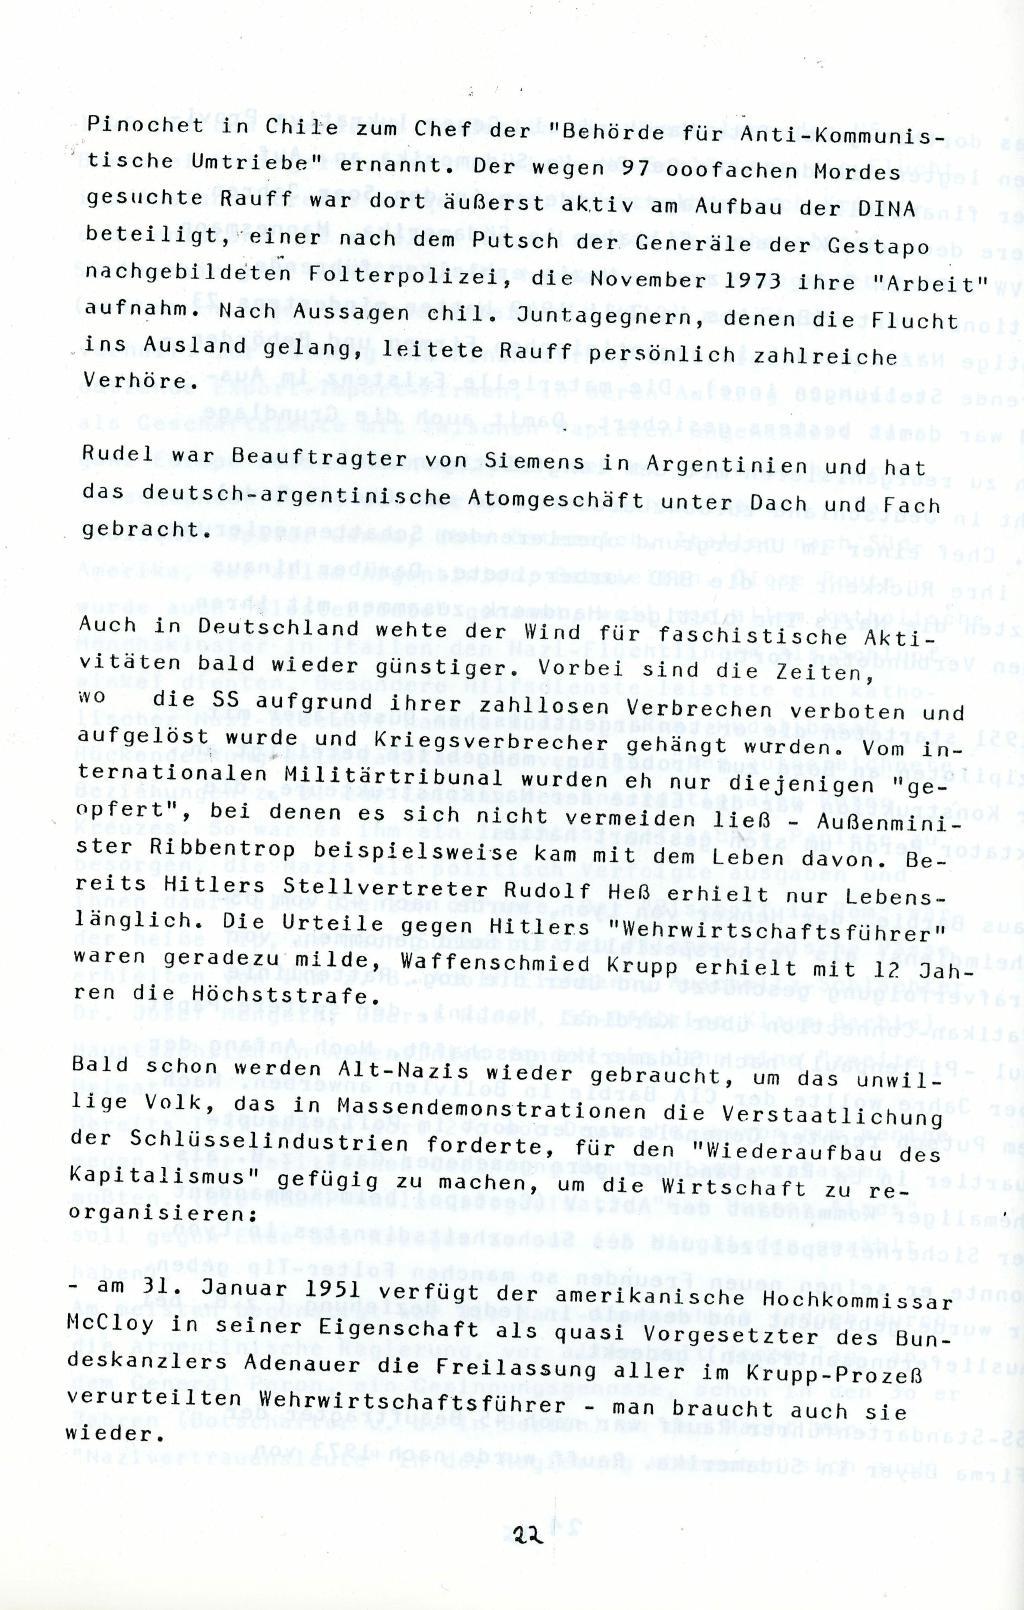 Berlin_1983_Autonome_Gruppen_Faschismus_im_Kapitalismus_22